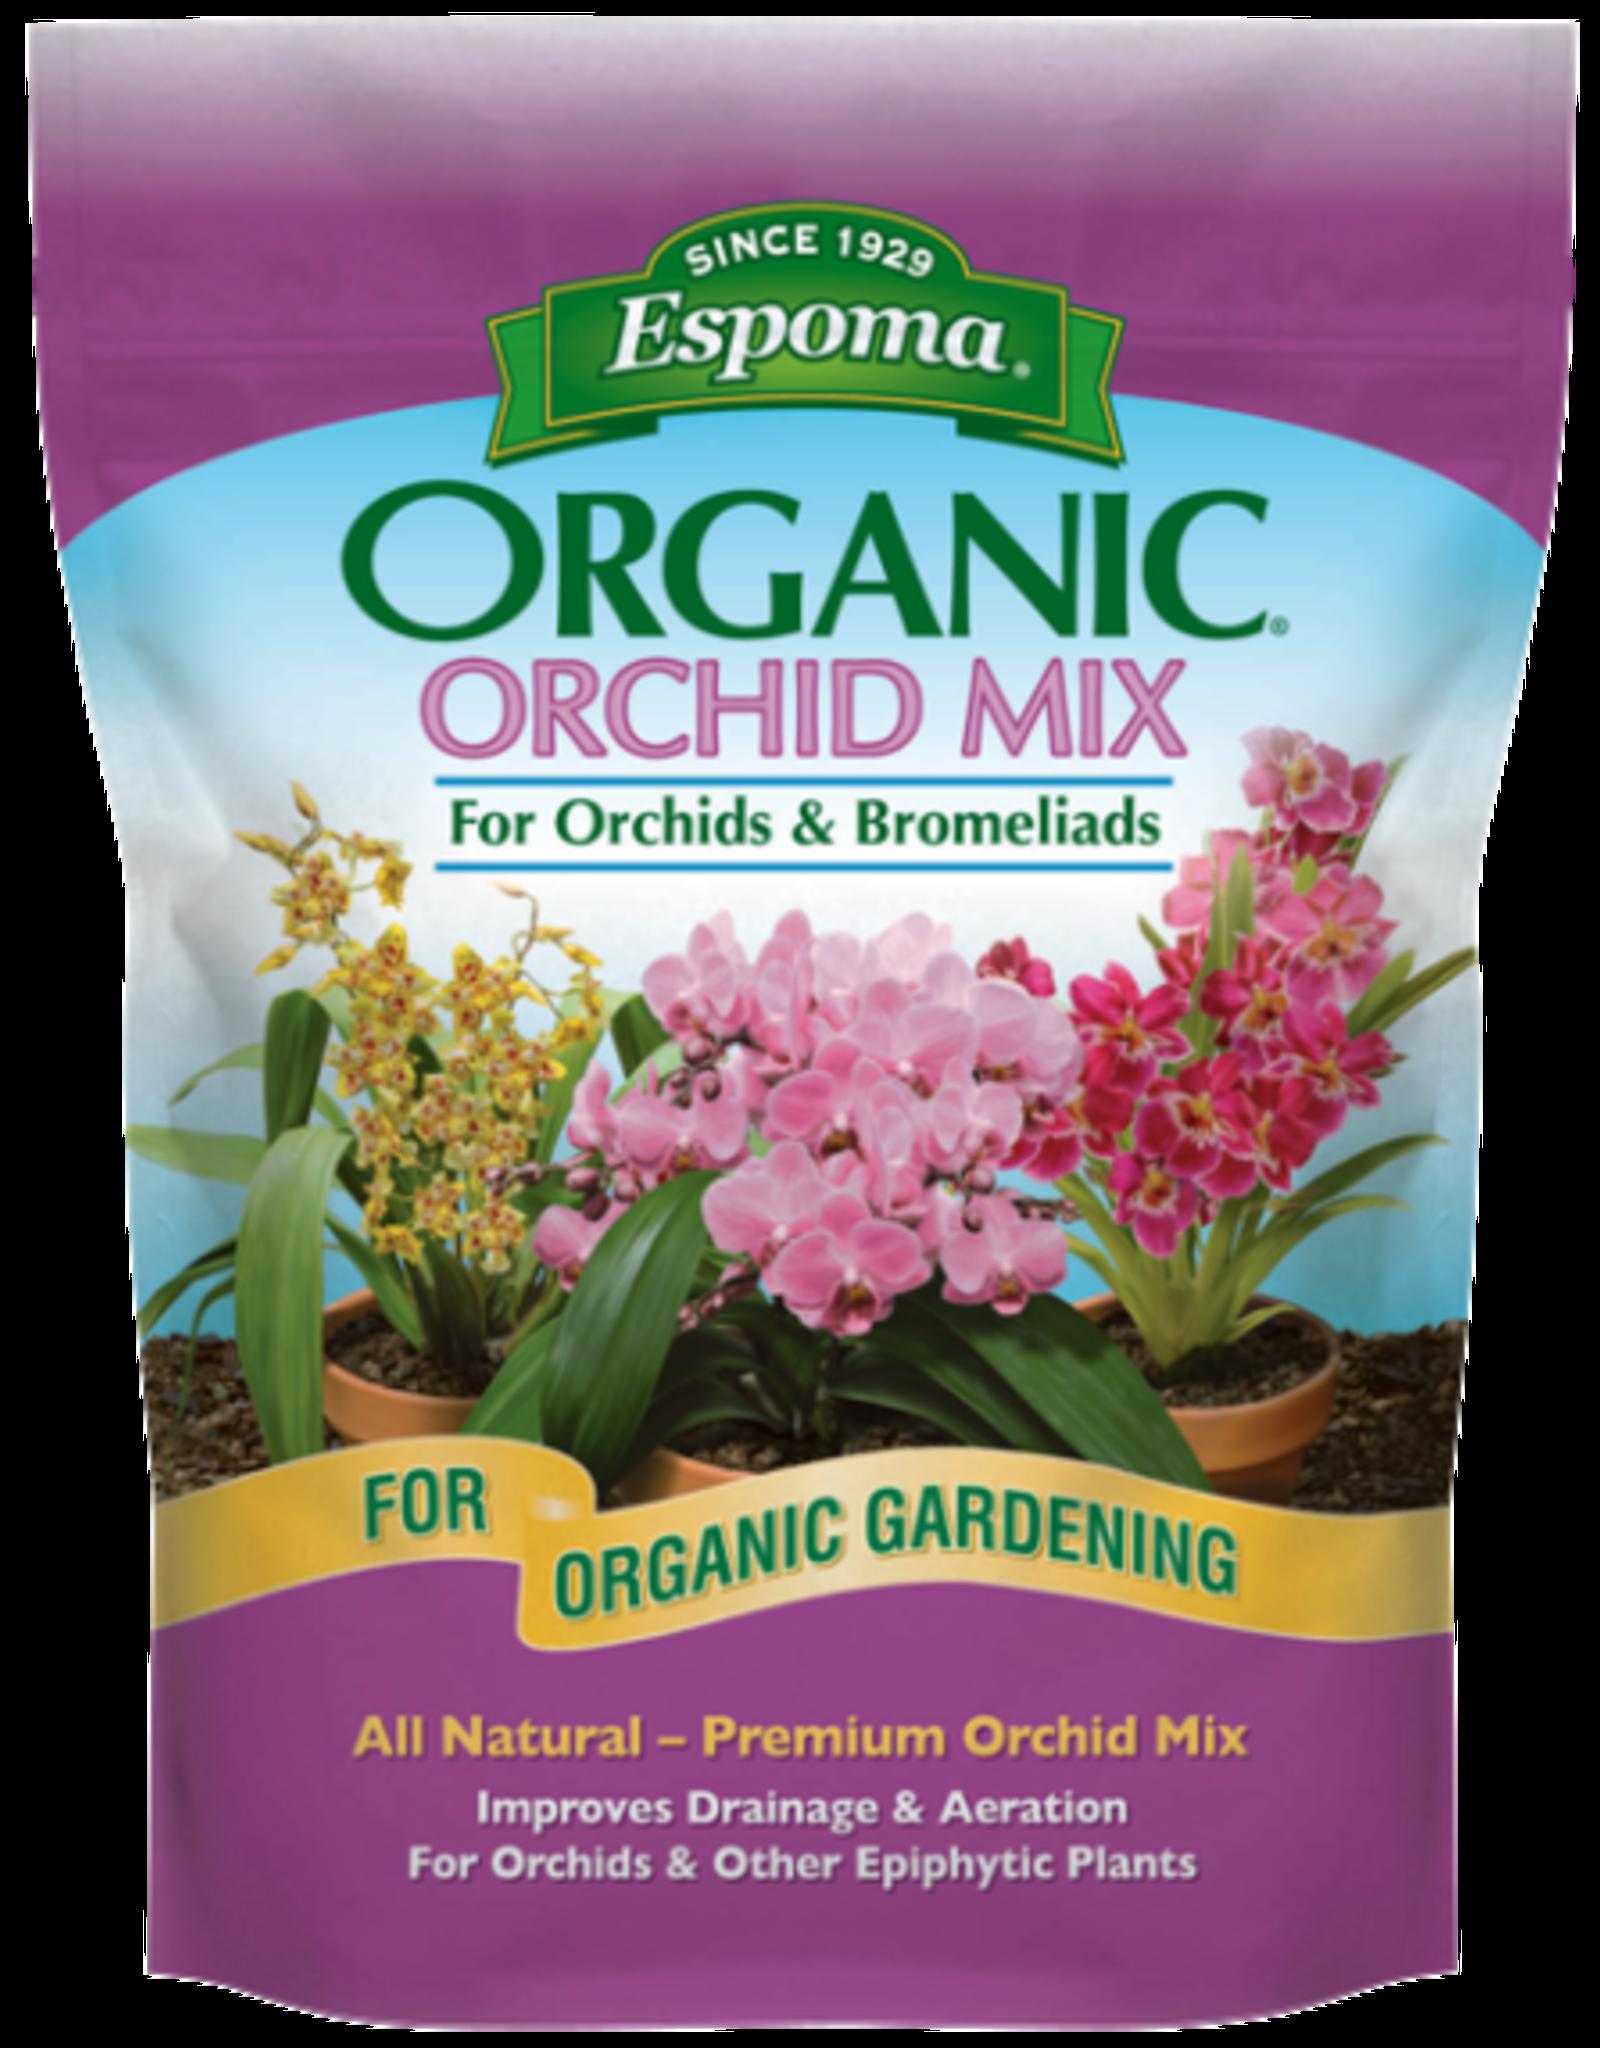 ESPOMA COMPANY ESPOMA ORCHID ORGANIC MIX 4QT